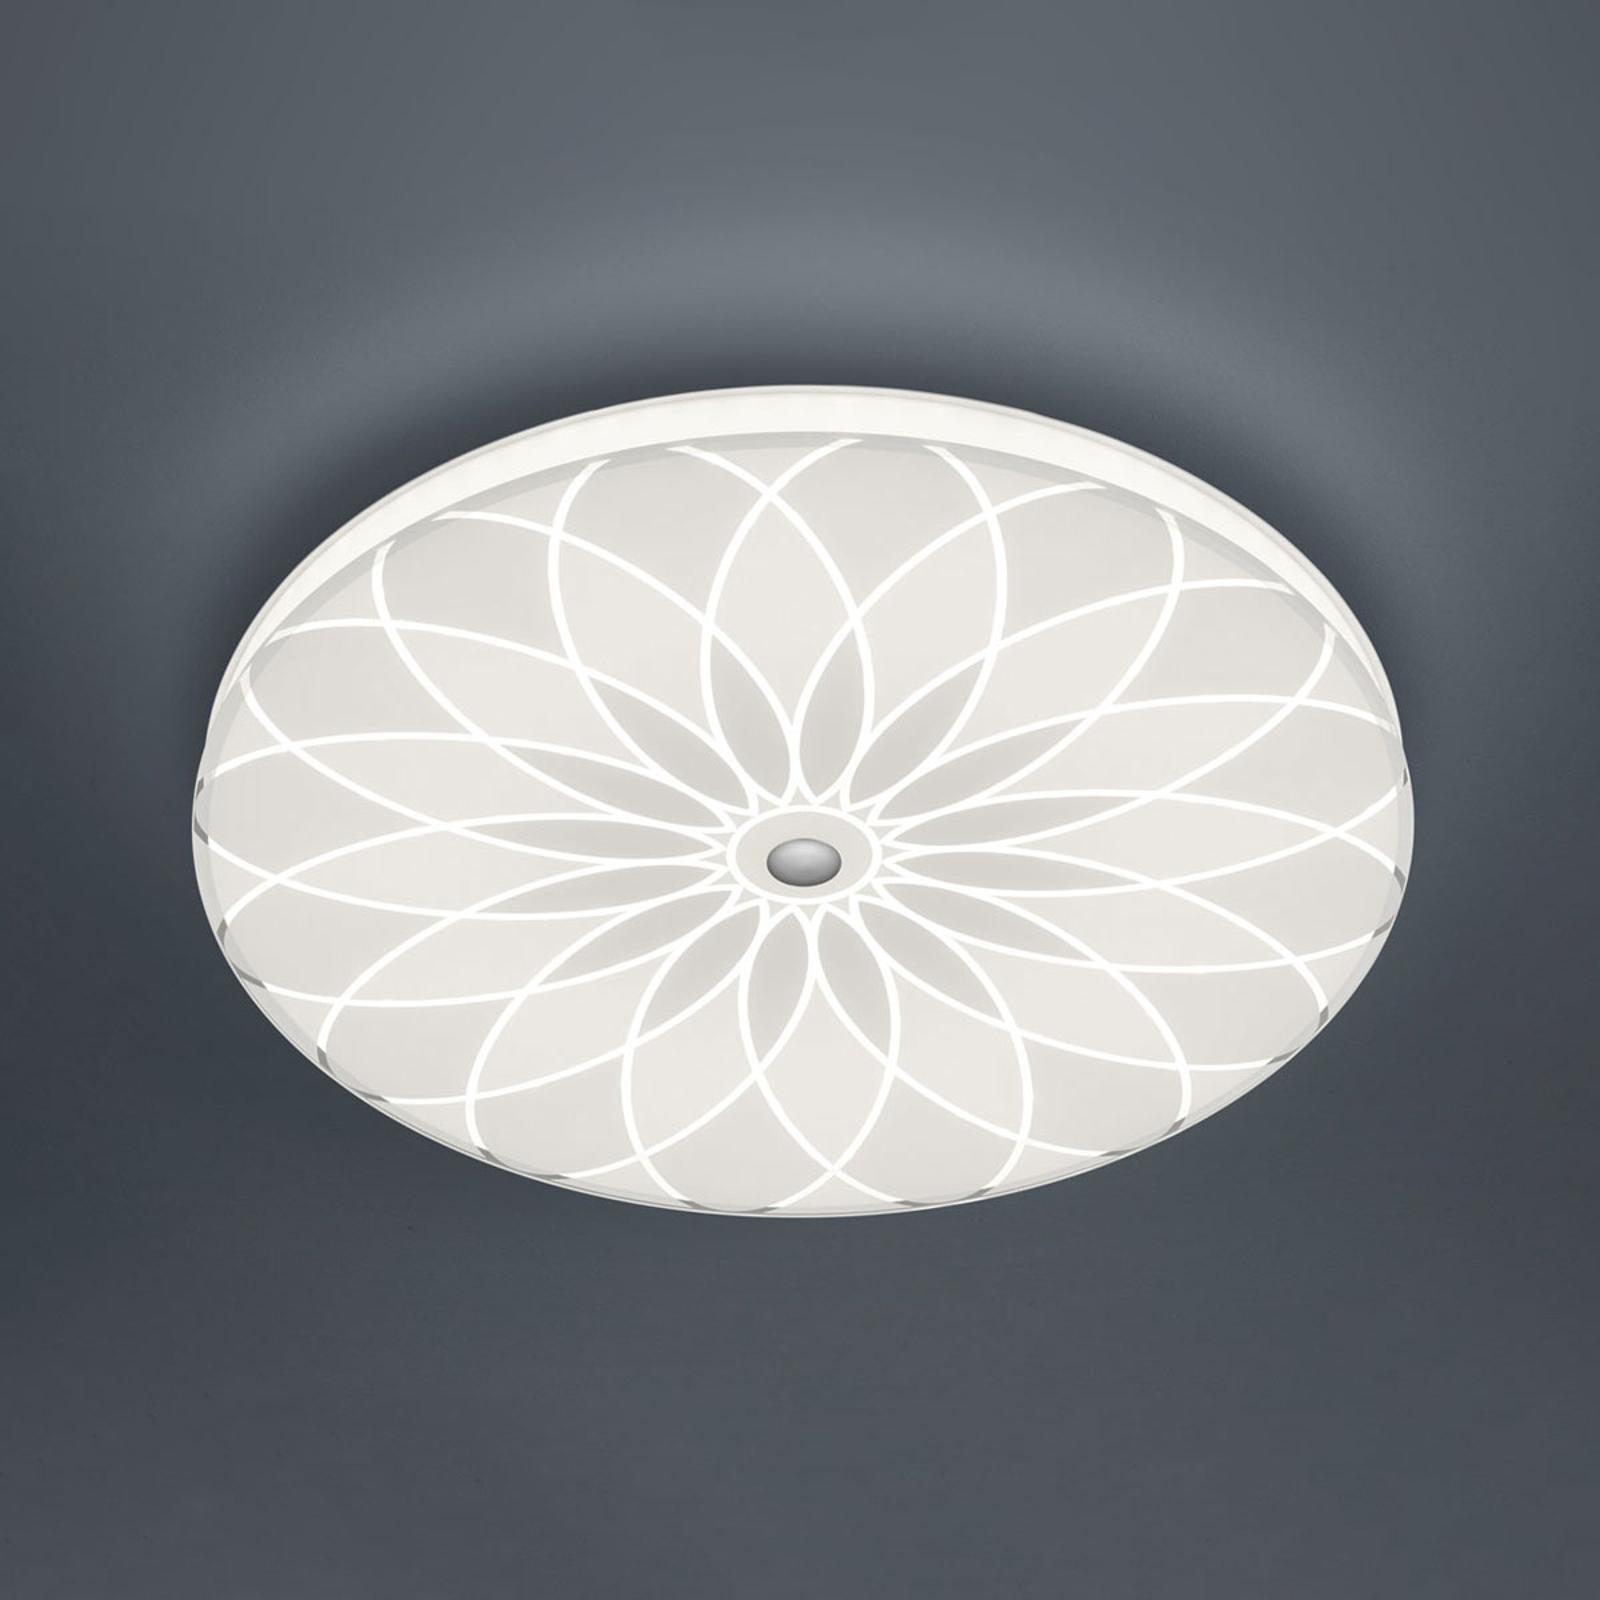 BANKAMP Mandala plafoniera LED fiore, Ø 42 cm